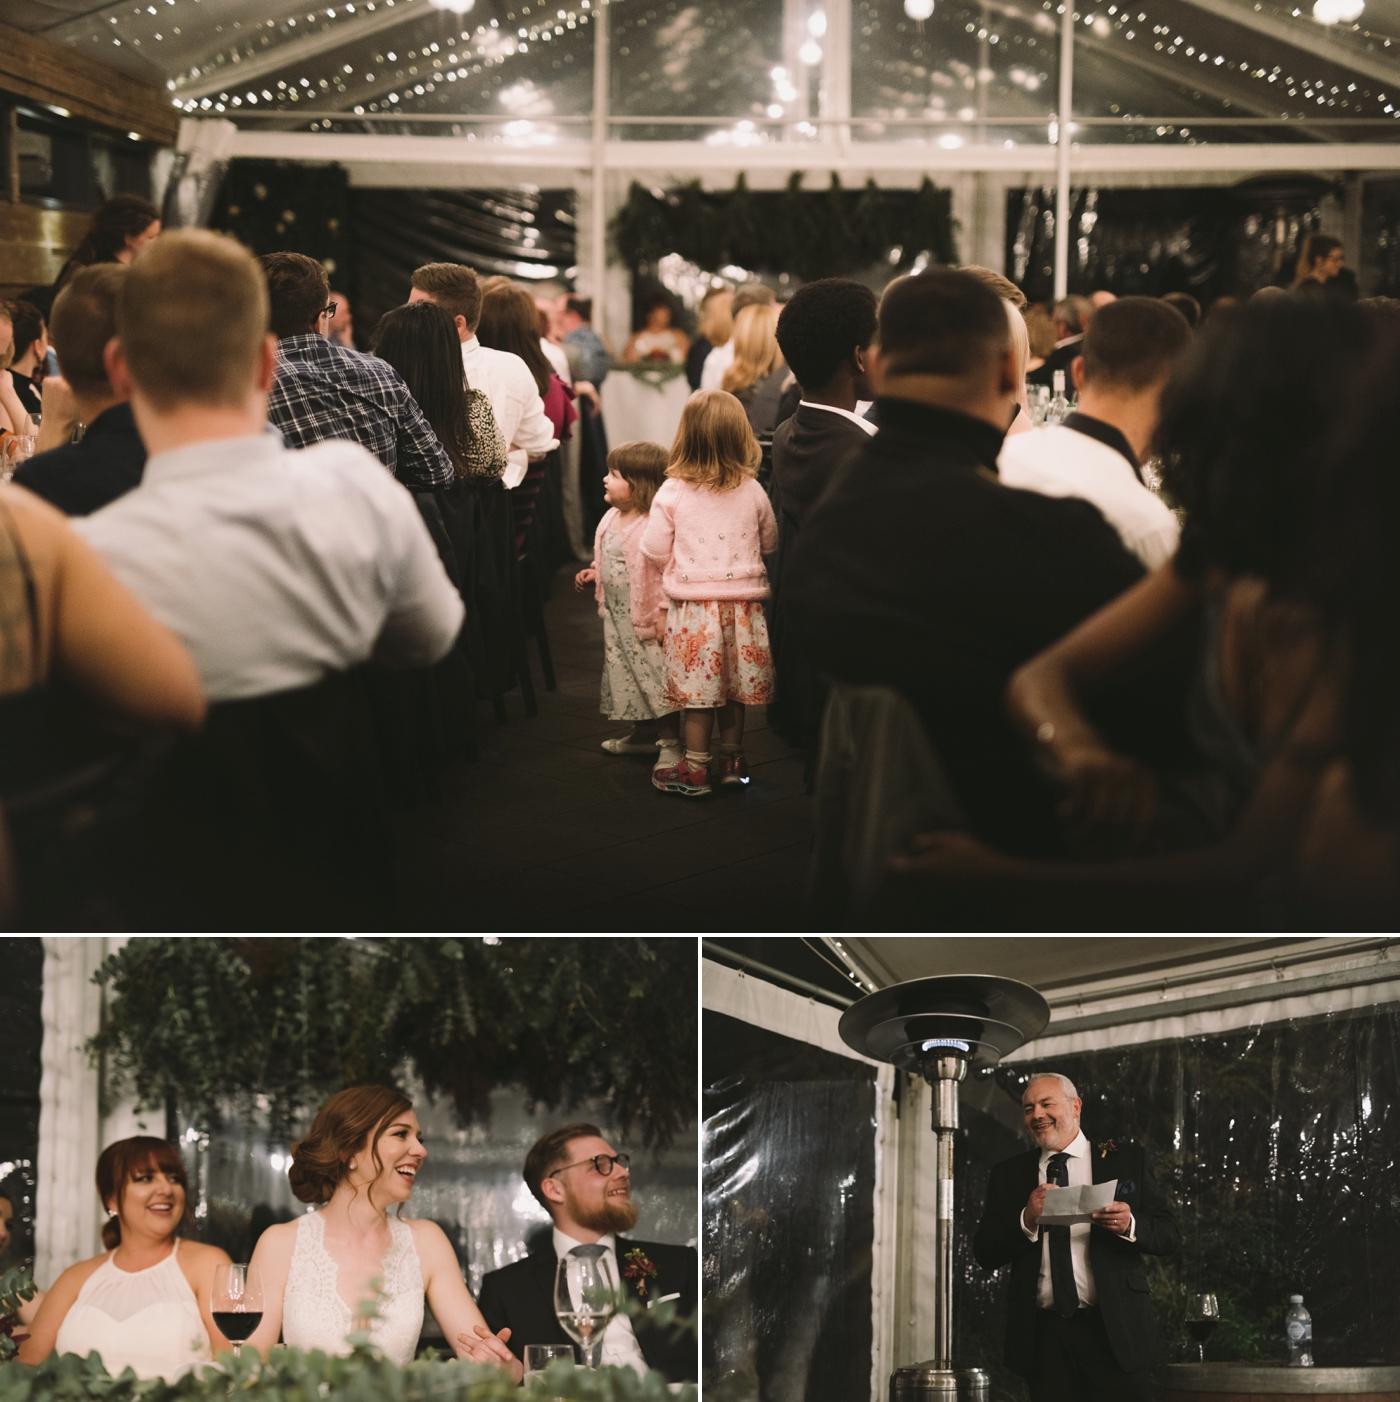 Erin & Ryan - Natural Wedding Photographer in Adelaide - Maximillians Wedding - Simple and Modern Wedding Photographer - Katherine Schultz - www.katherineschultzphotography.com_0055.jpg